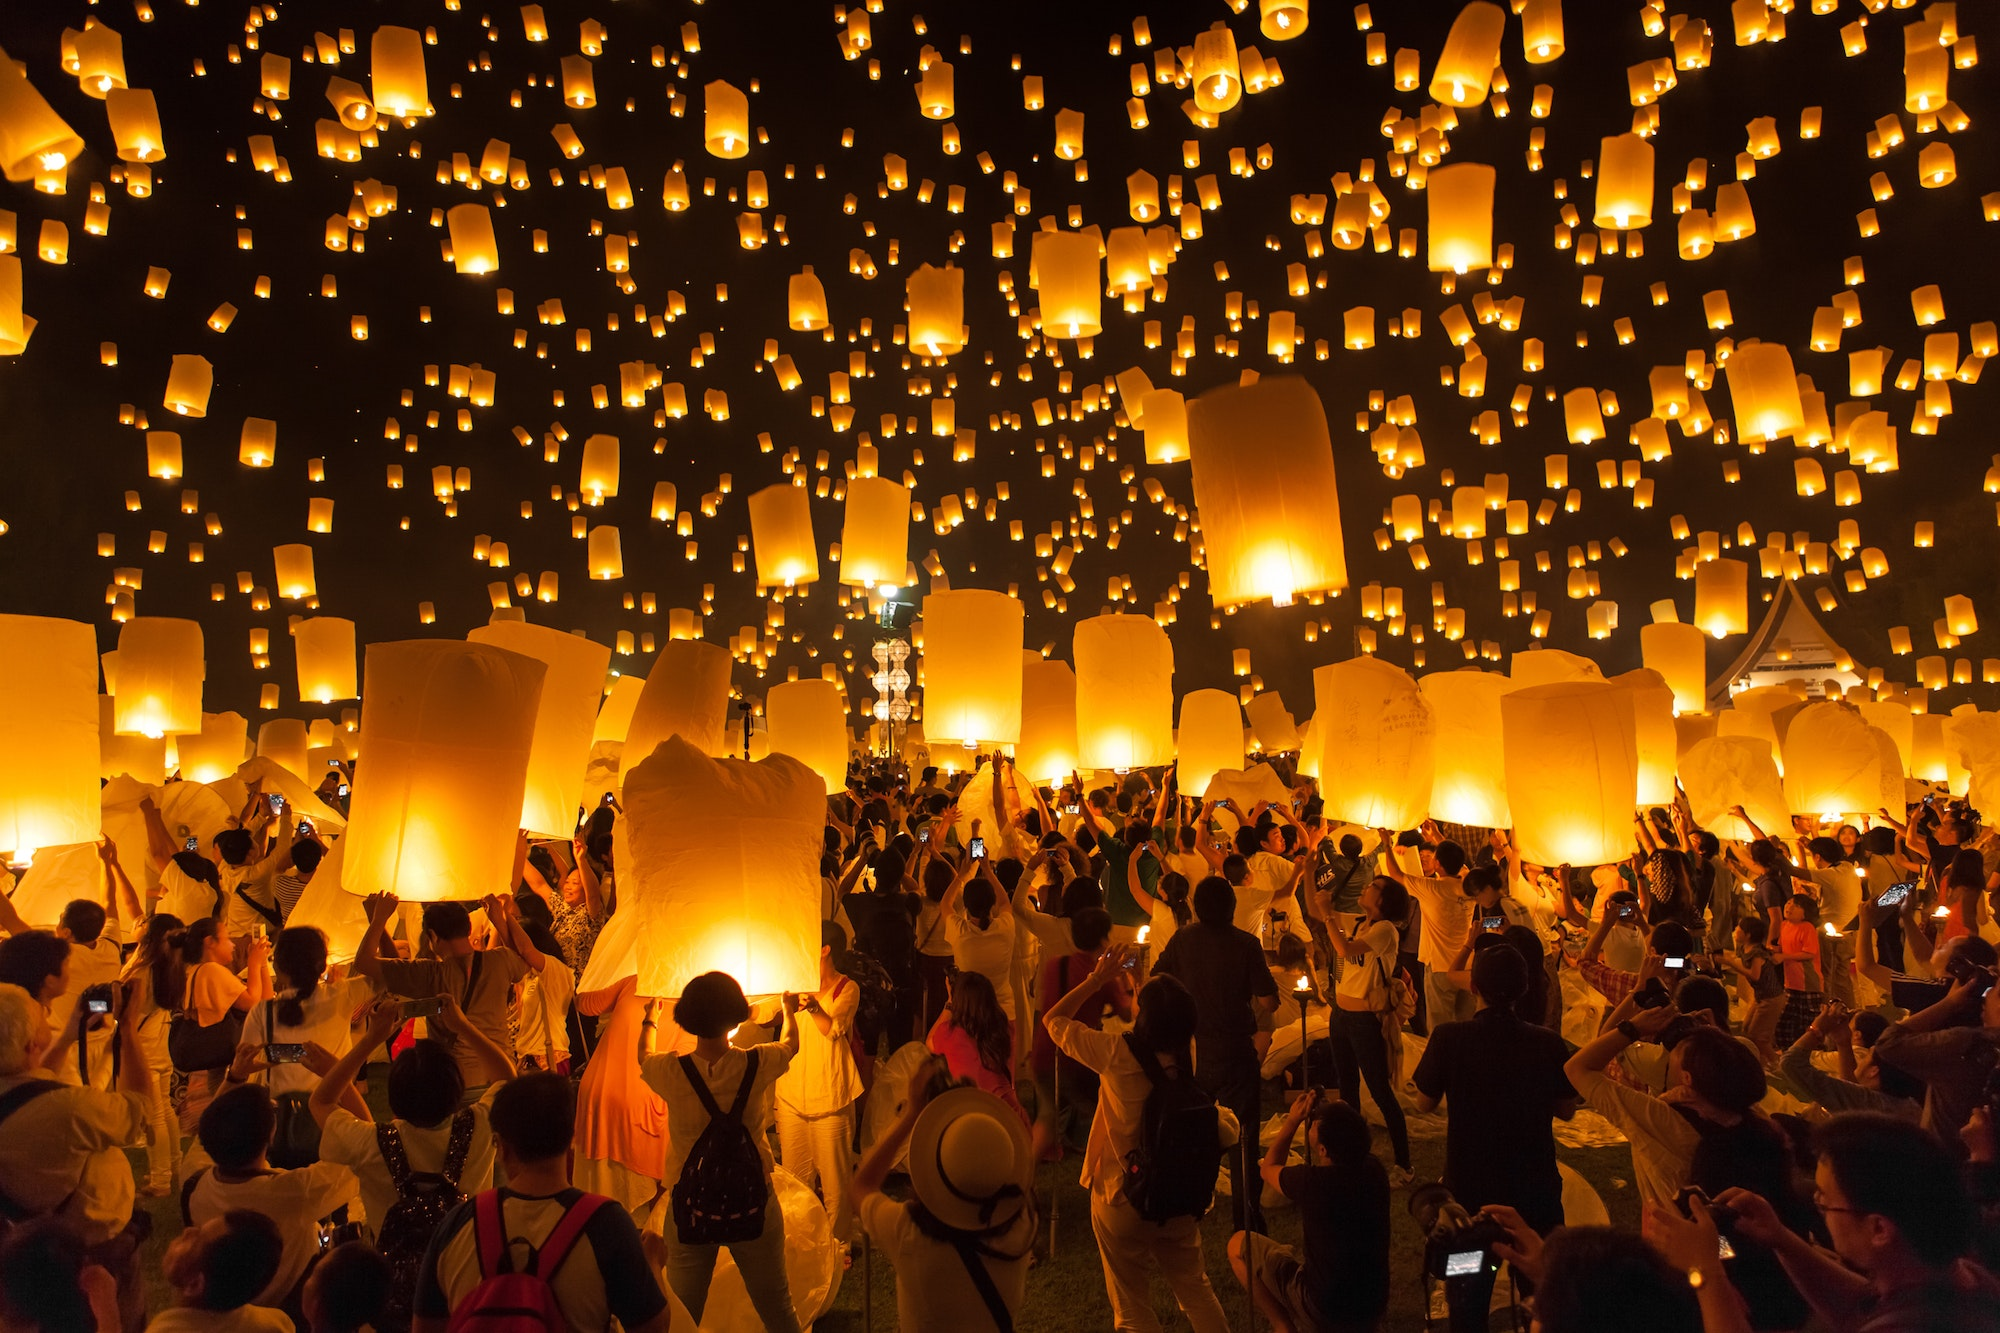 lantern festival - photo #19